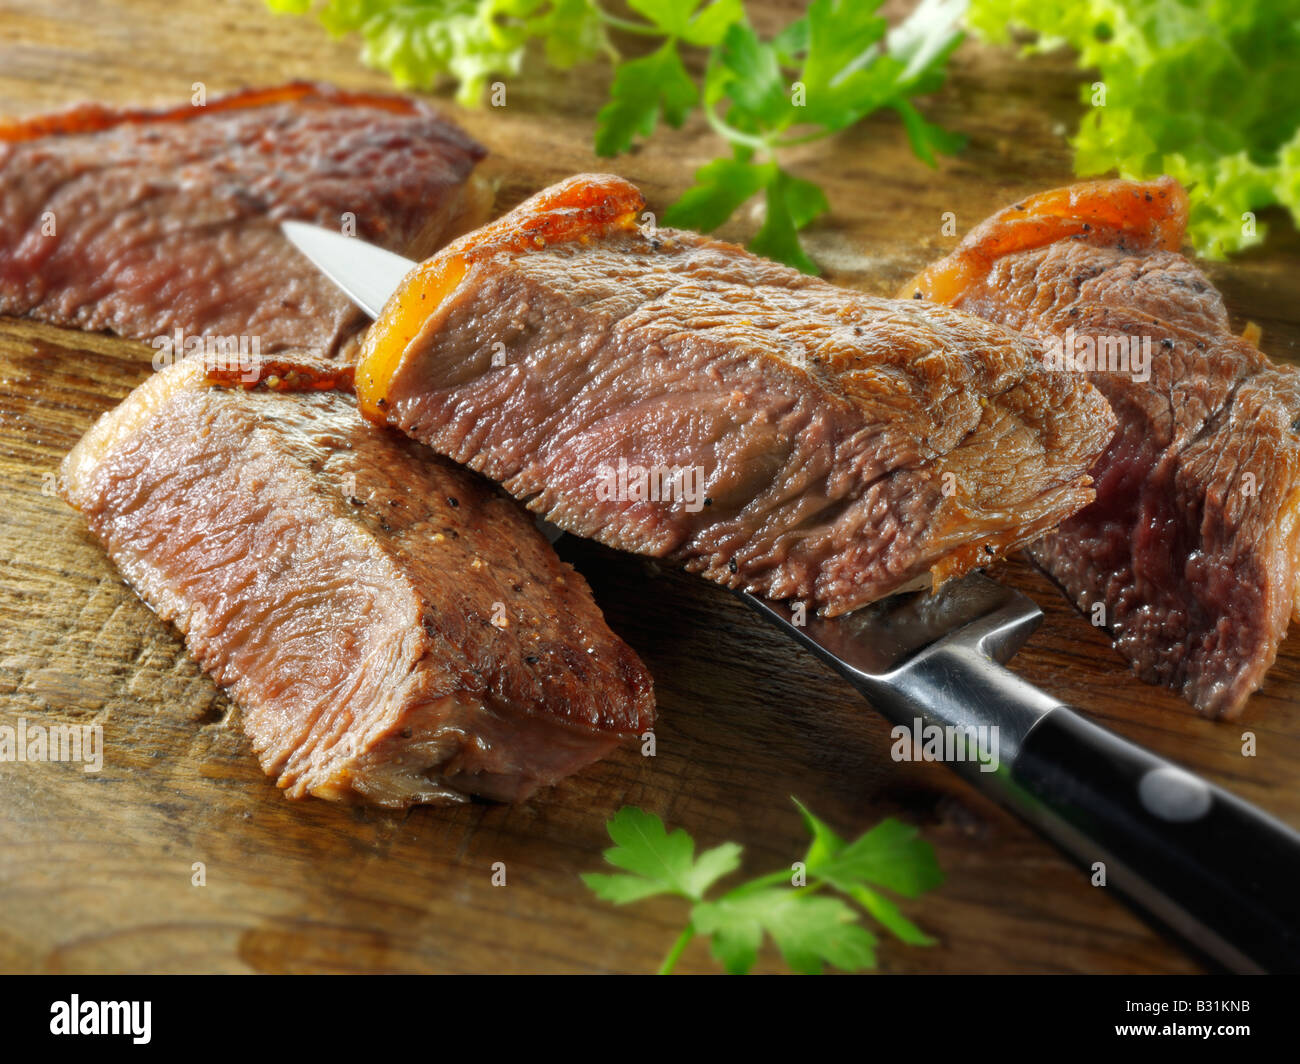 Carne de solomillo steak - bien hecho Imagen De Stock